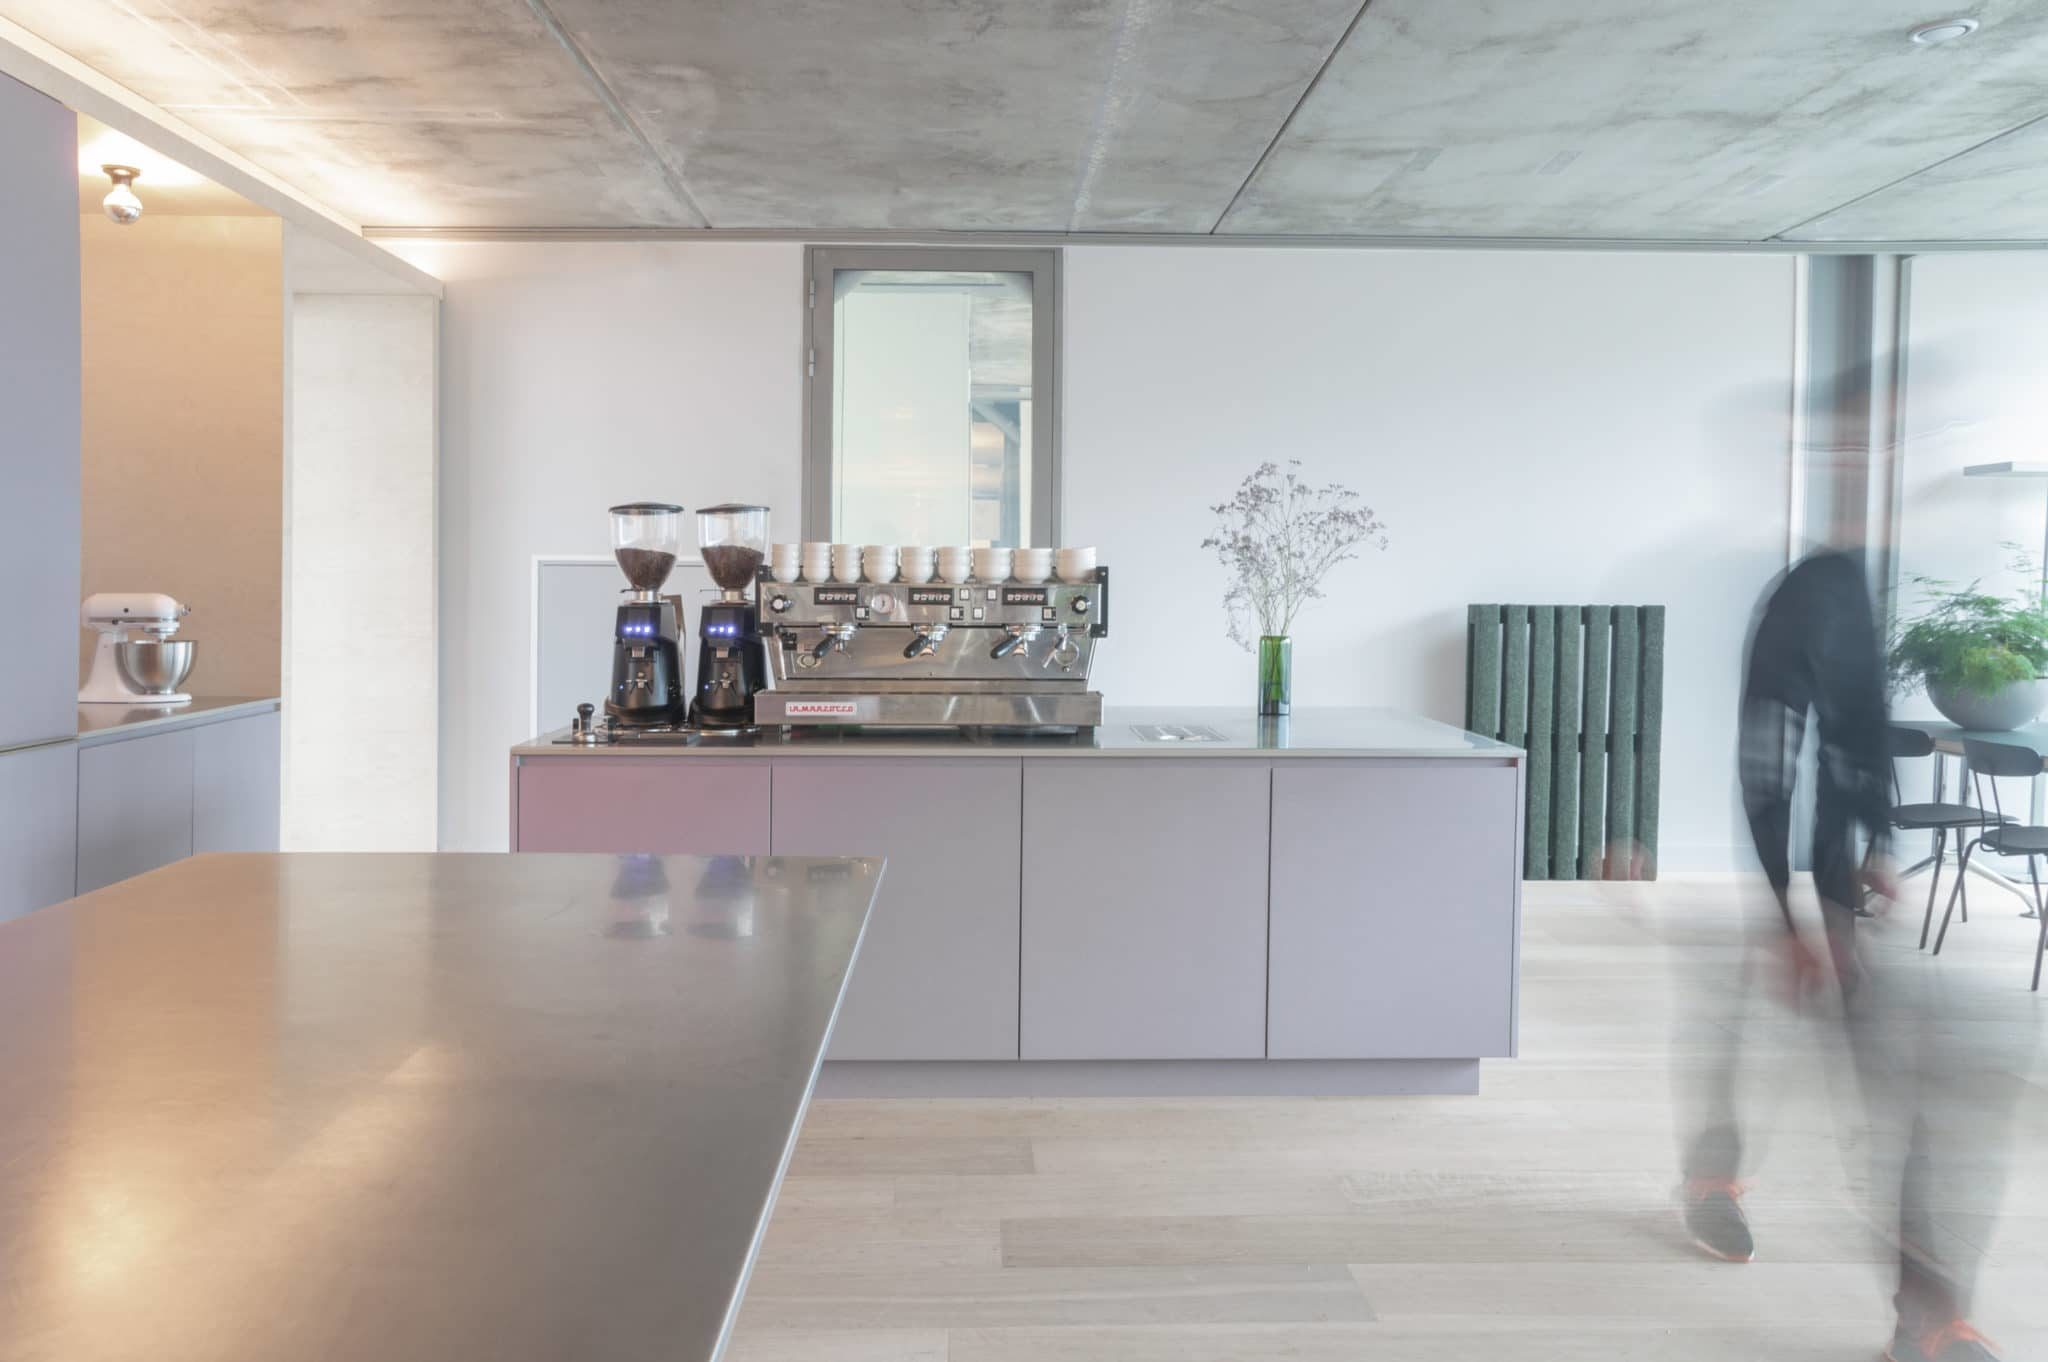 enbiun studio job kitchen office design